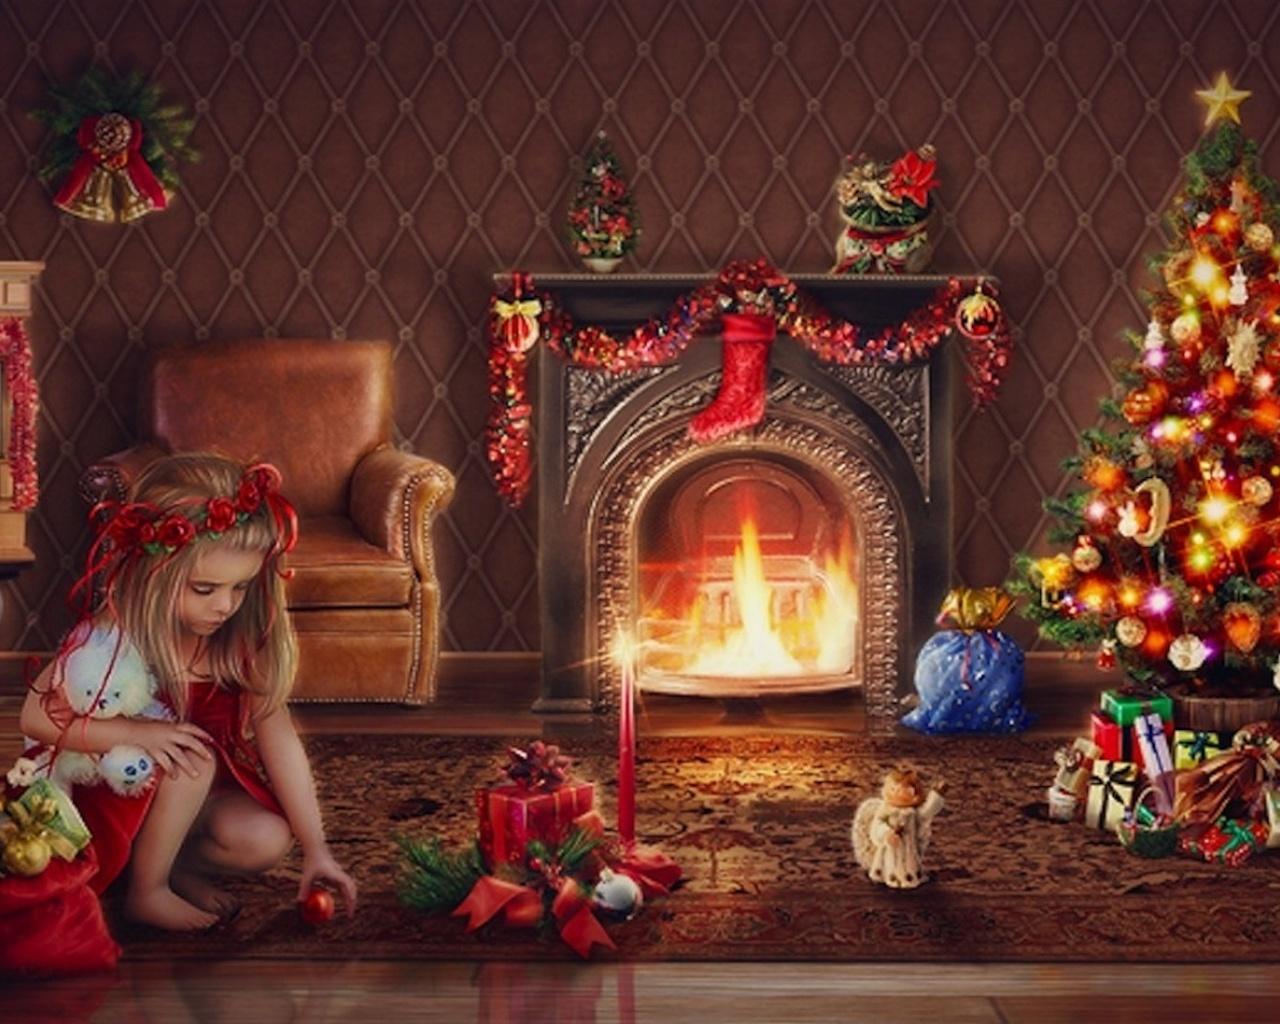 праздник, арт, дети, позитив